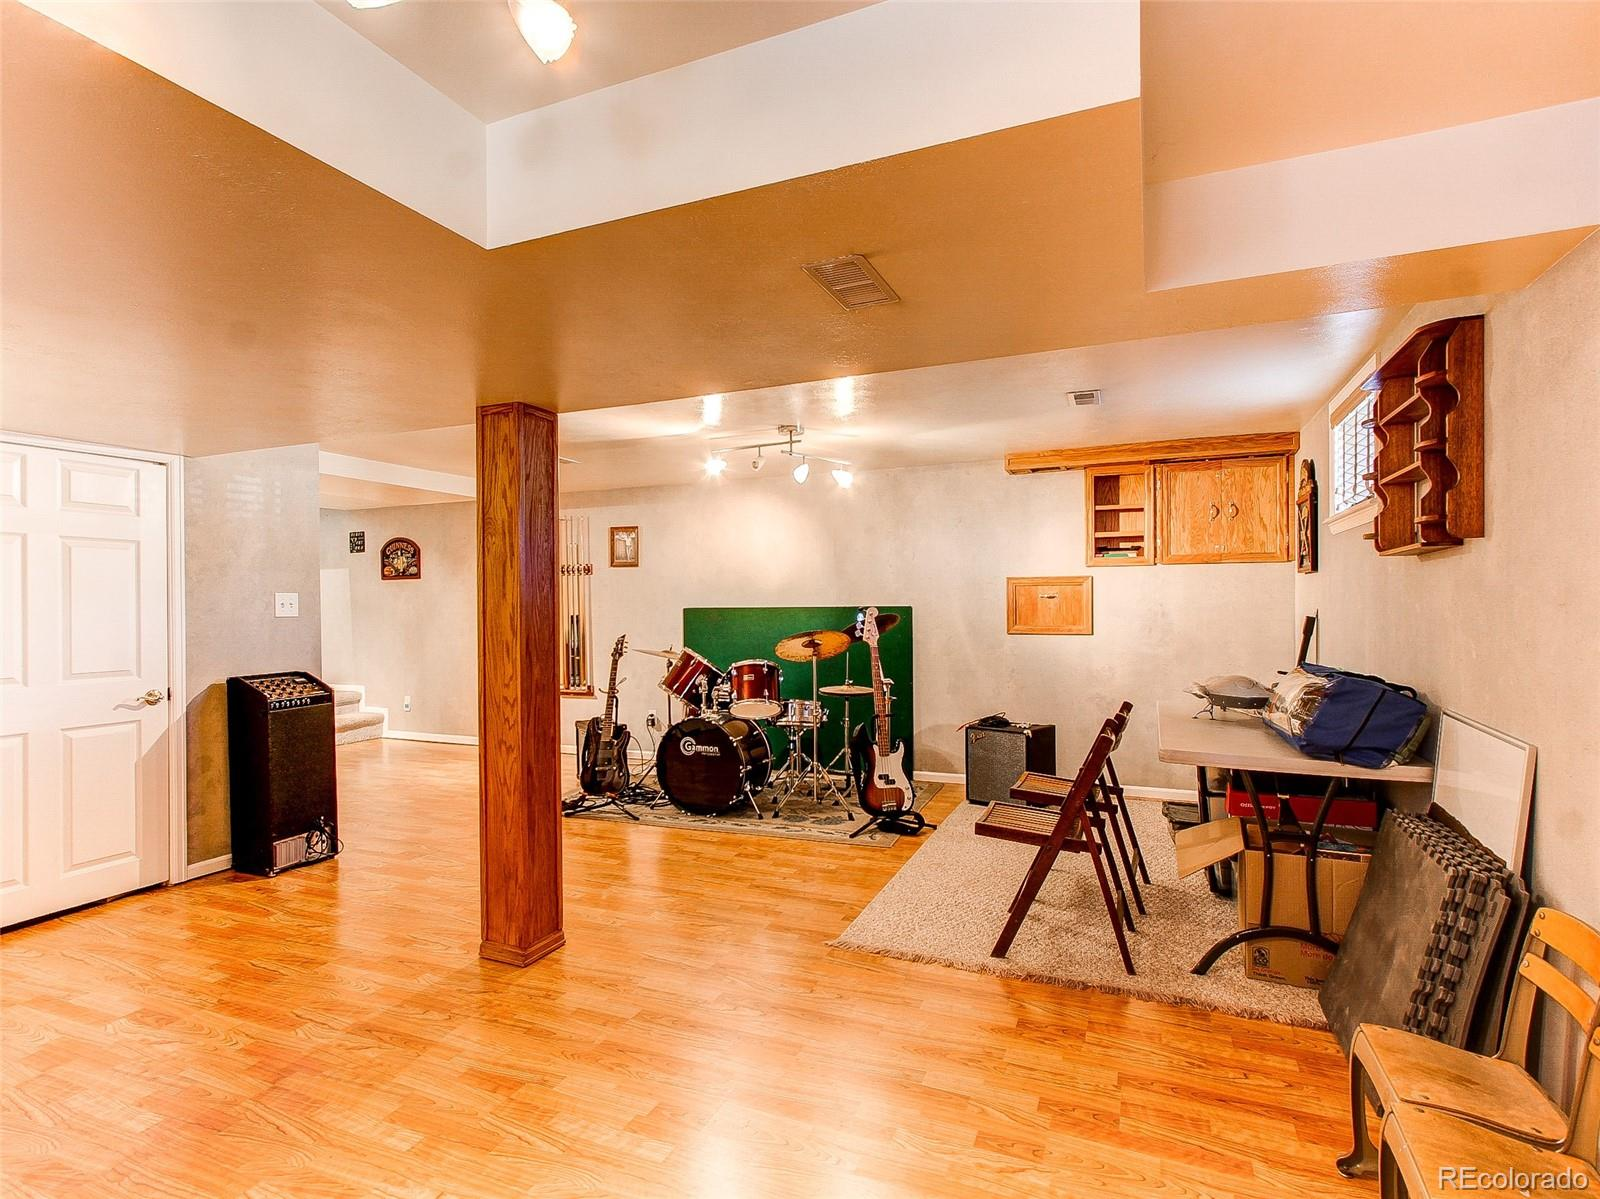 MLS# 3238375 - 31 - 1506 S Hoyt Street, Lakewood, CO 80232